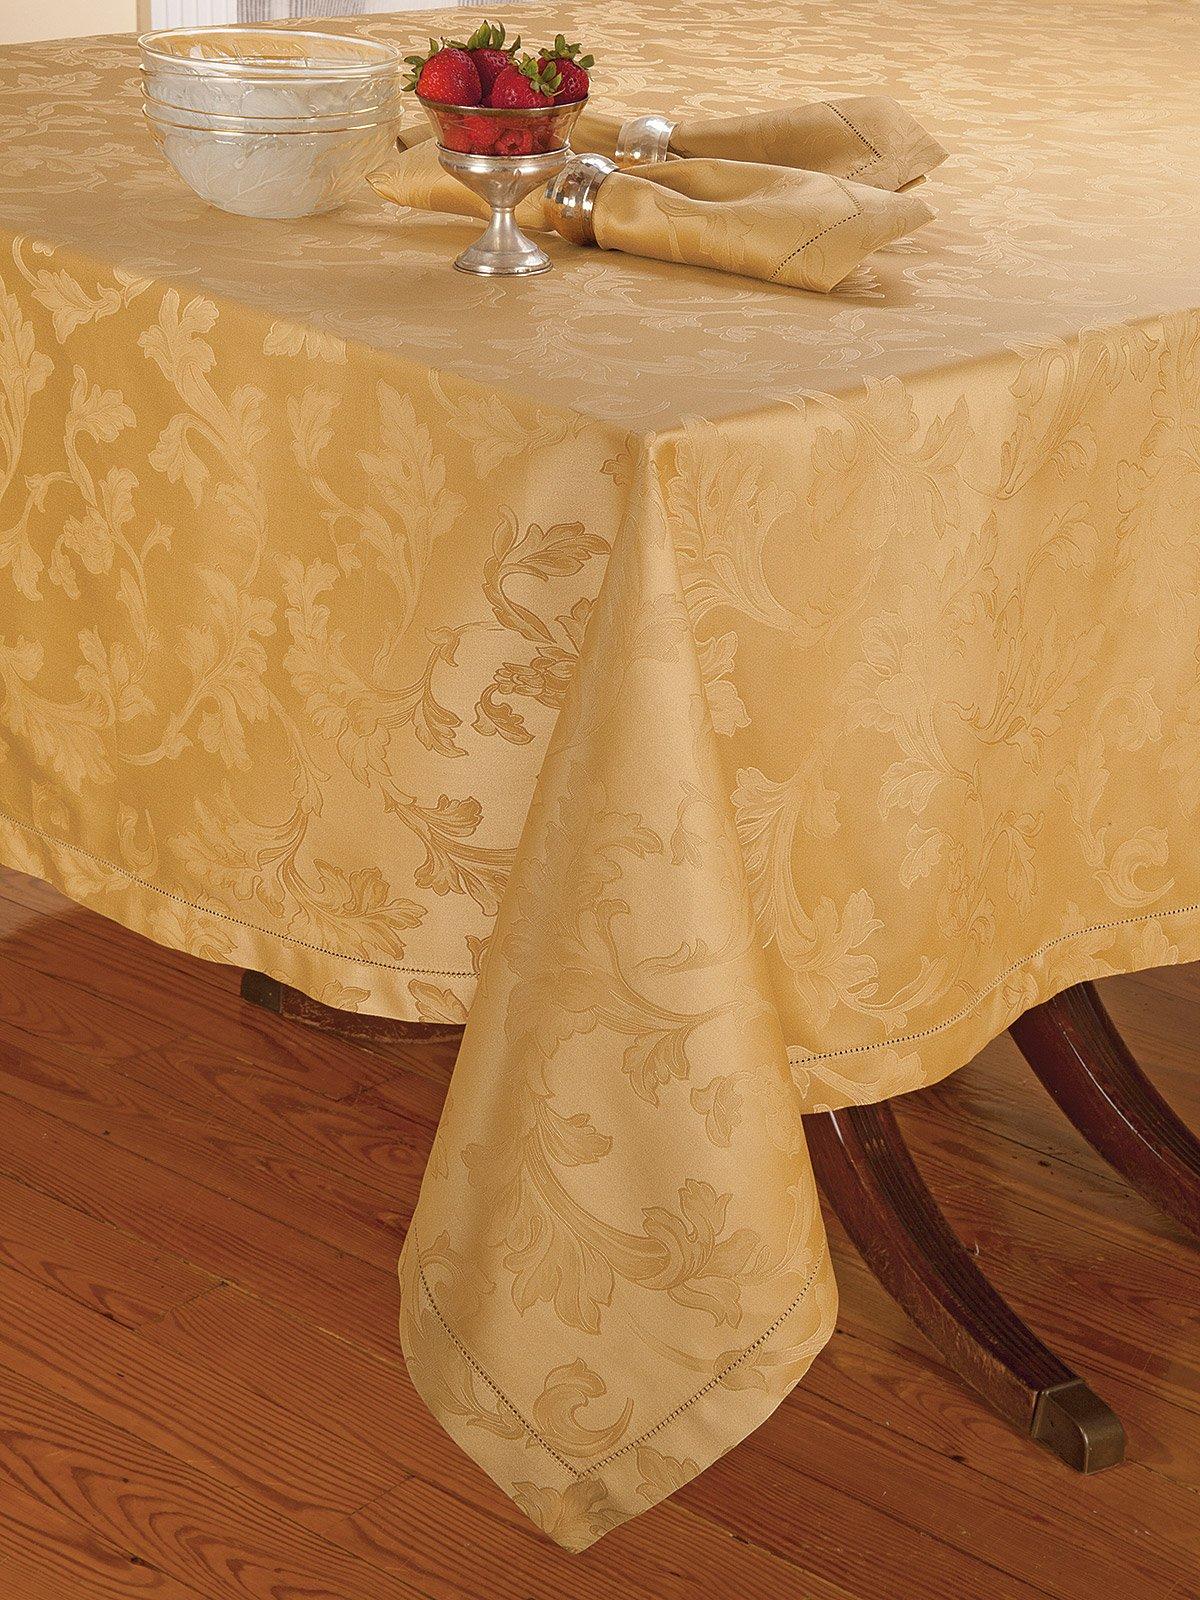 Wonderful Kingsbury Tablecloth: Gold